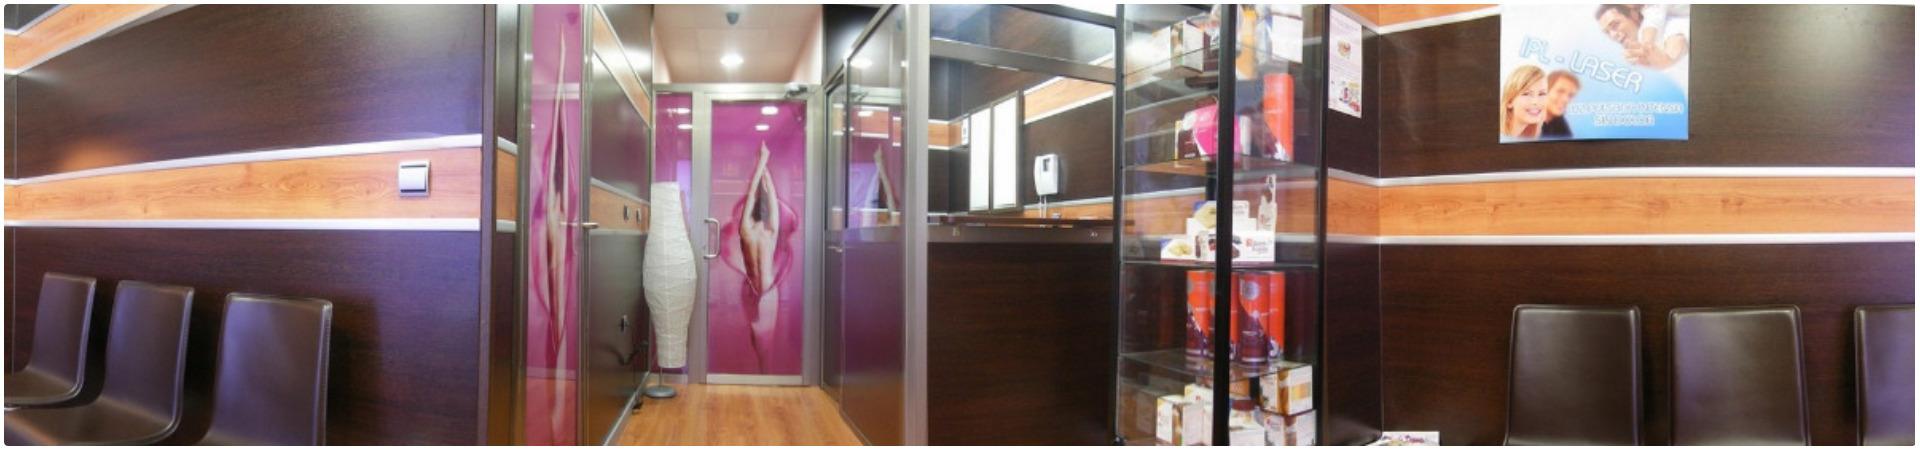 Sport Salud, sport salud en motril, fisioterapia en motril, masajes en motril, masajes motril,